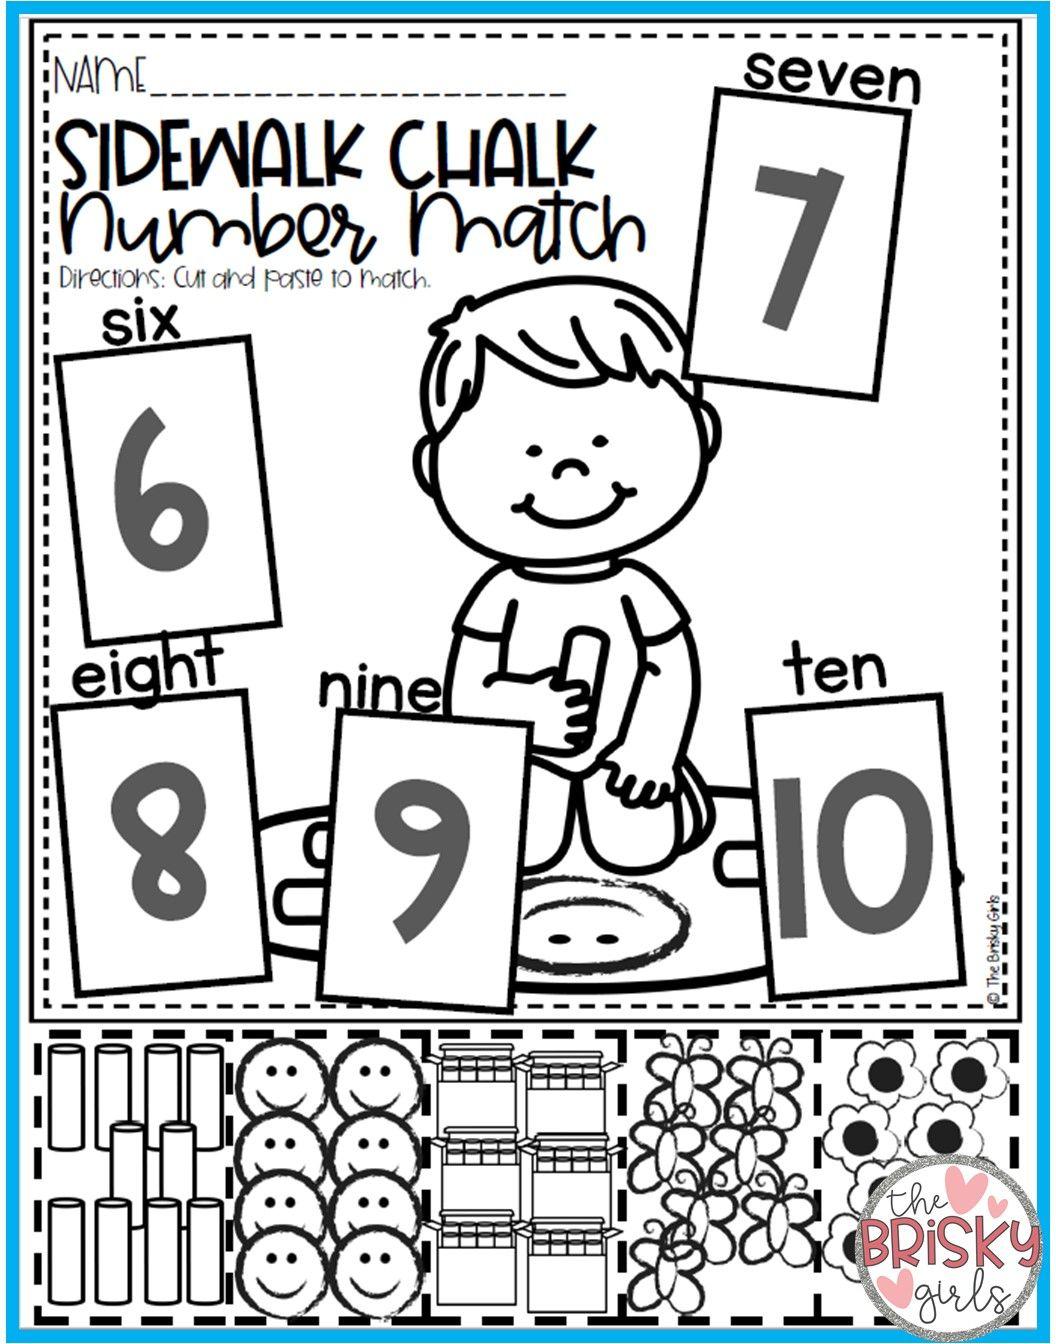 Kindergarten Math Kindergarten Math Activities Kindergarten Math Worksheets Kinderg Kindergarten Math Worksheets Kindergarten Math Numbers Kindergarten Math [ 1344 x 1056 Pixel ]